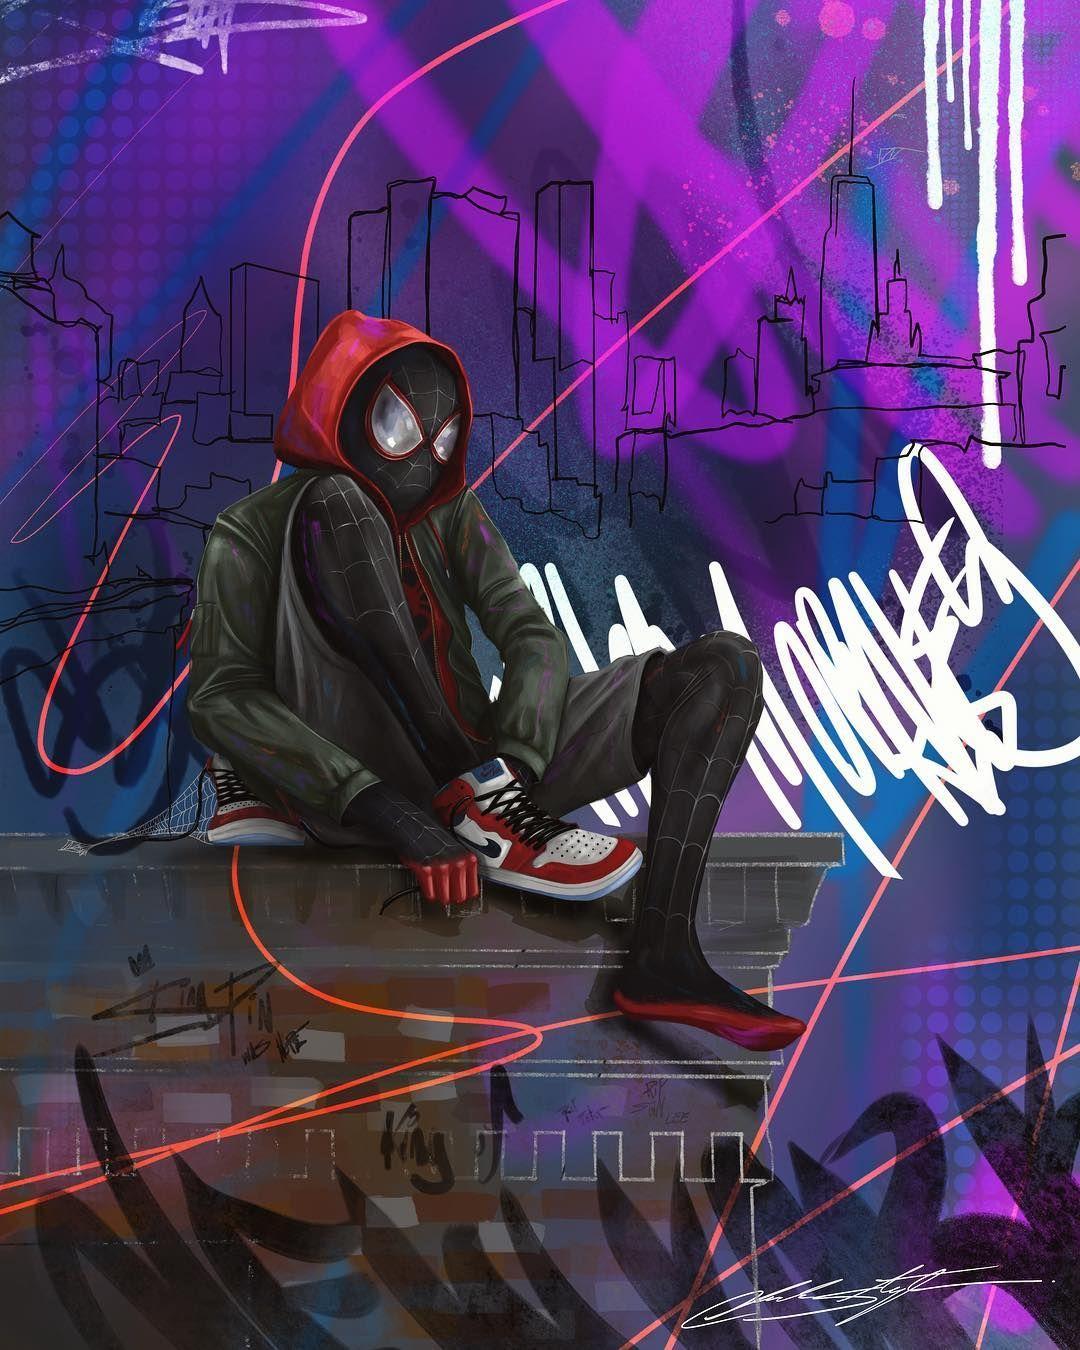 SpiderMan Miles Morales Rooftop Batman wallpaper